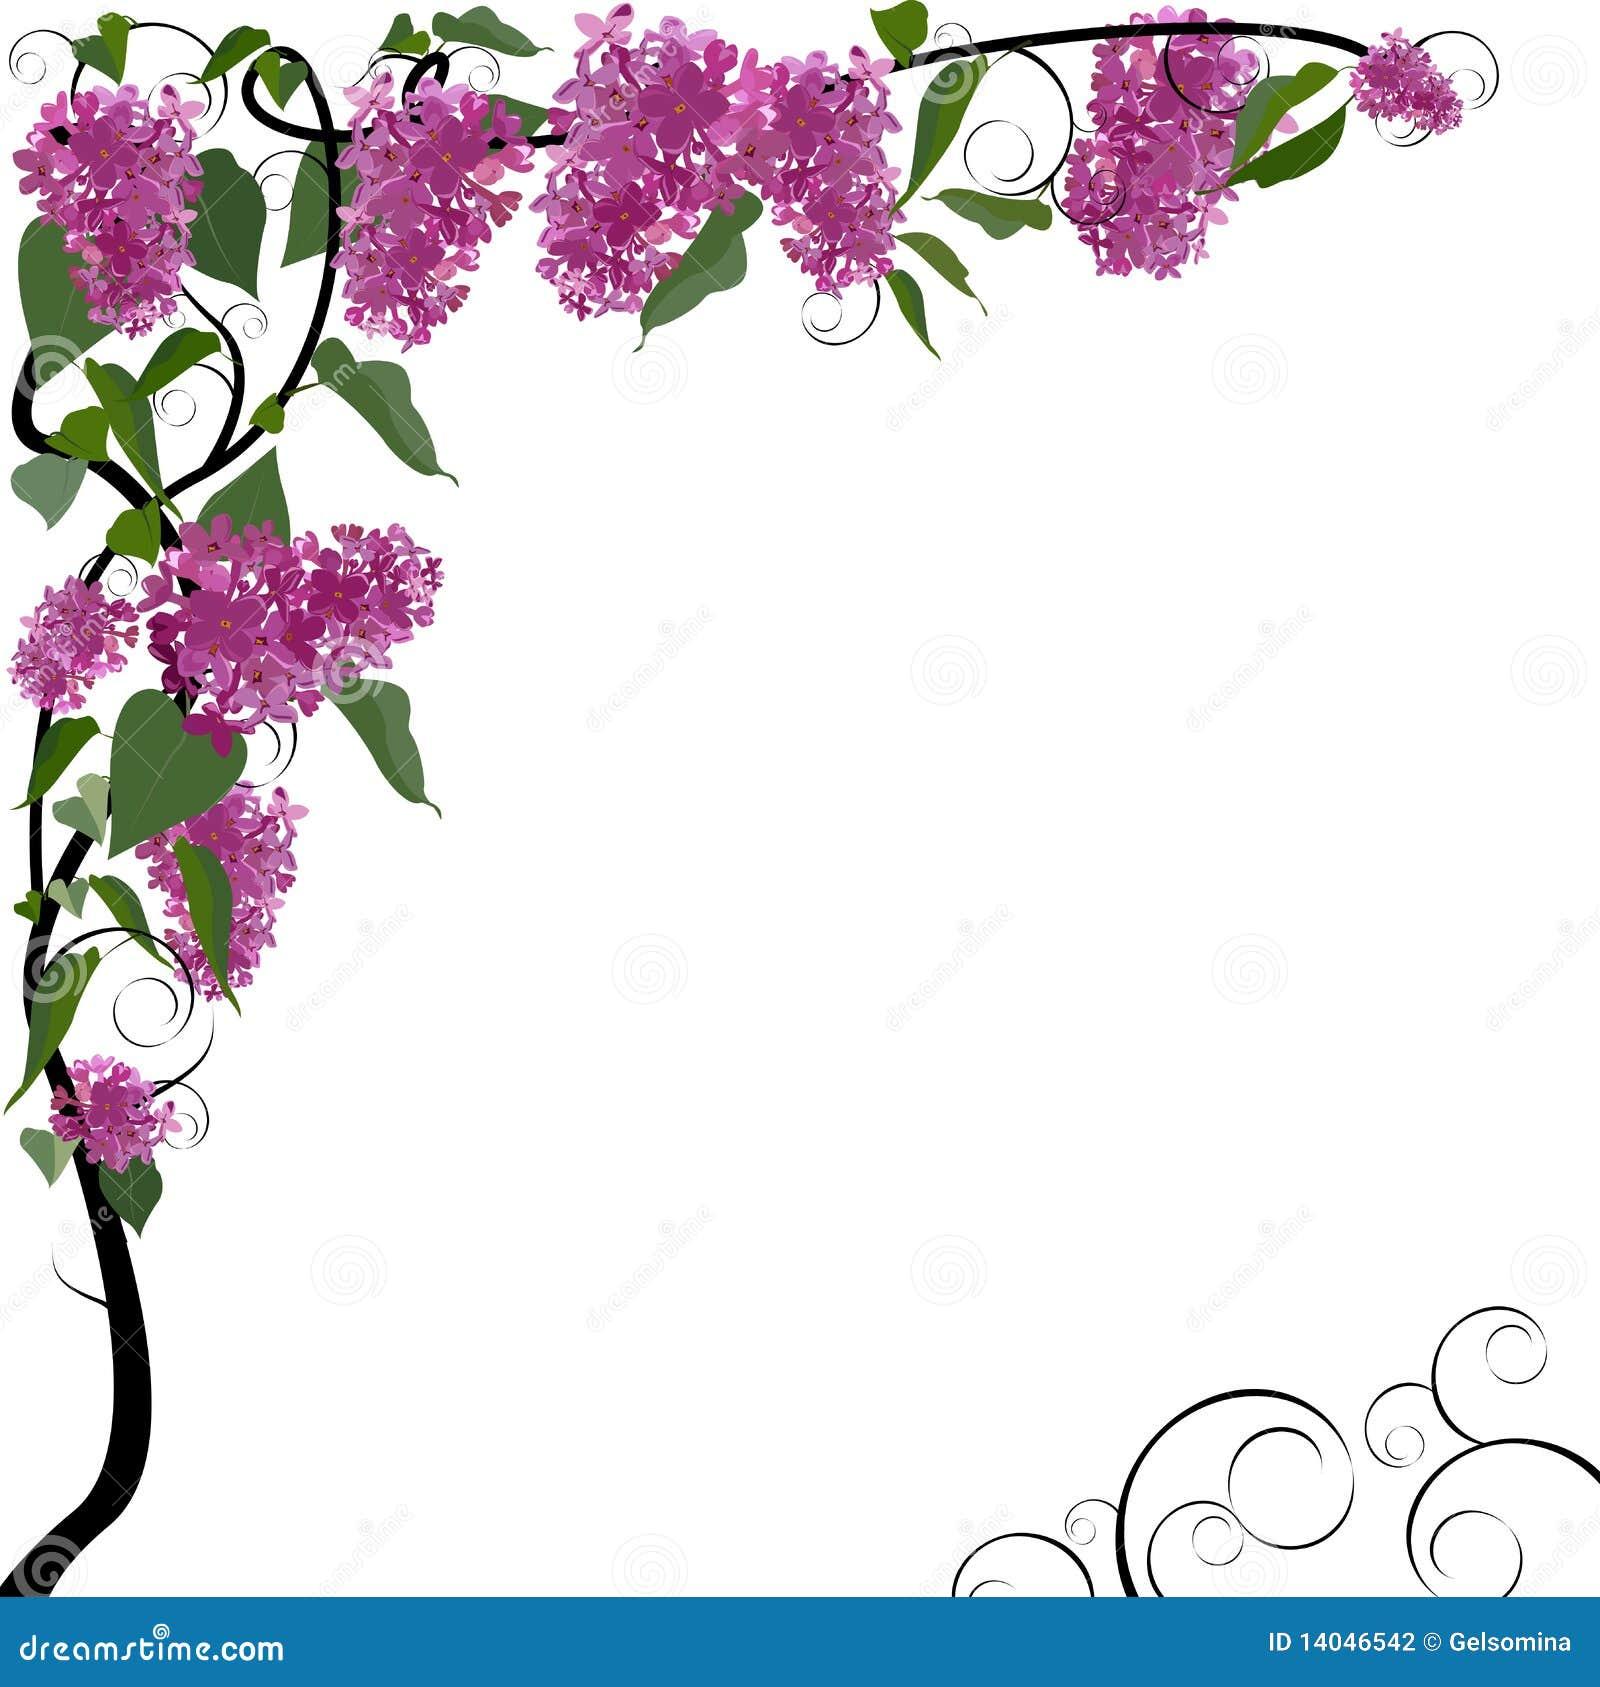 vector floral border stock vector illustration of abstract 14046542 rh dreamstime com floral border vector vintage flower border vector free download